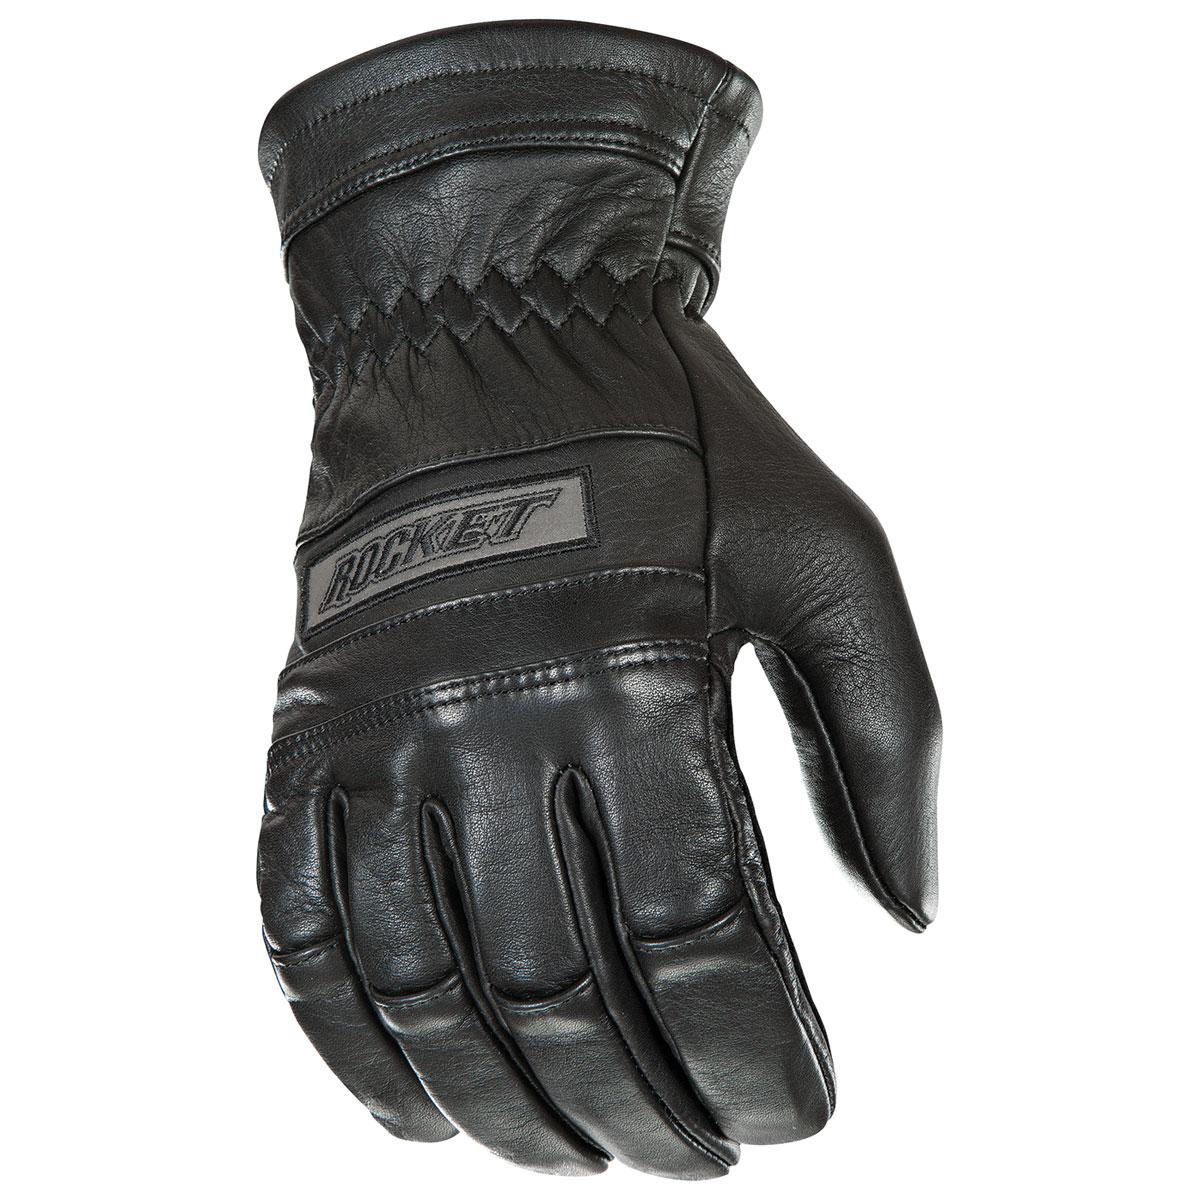 Joe Rocket Men's Thick Fit Classic Black Gloves